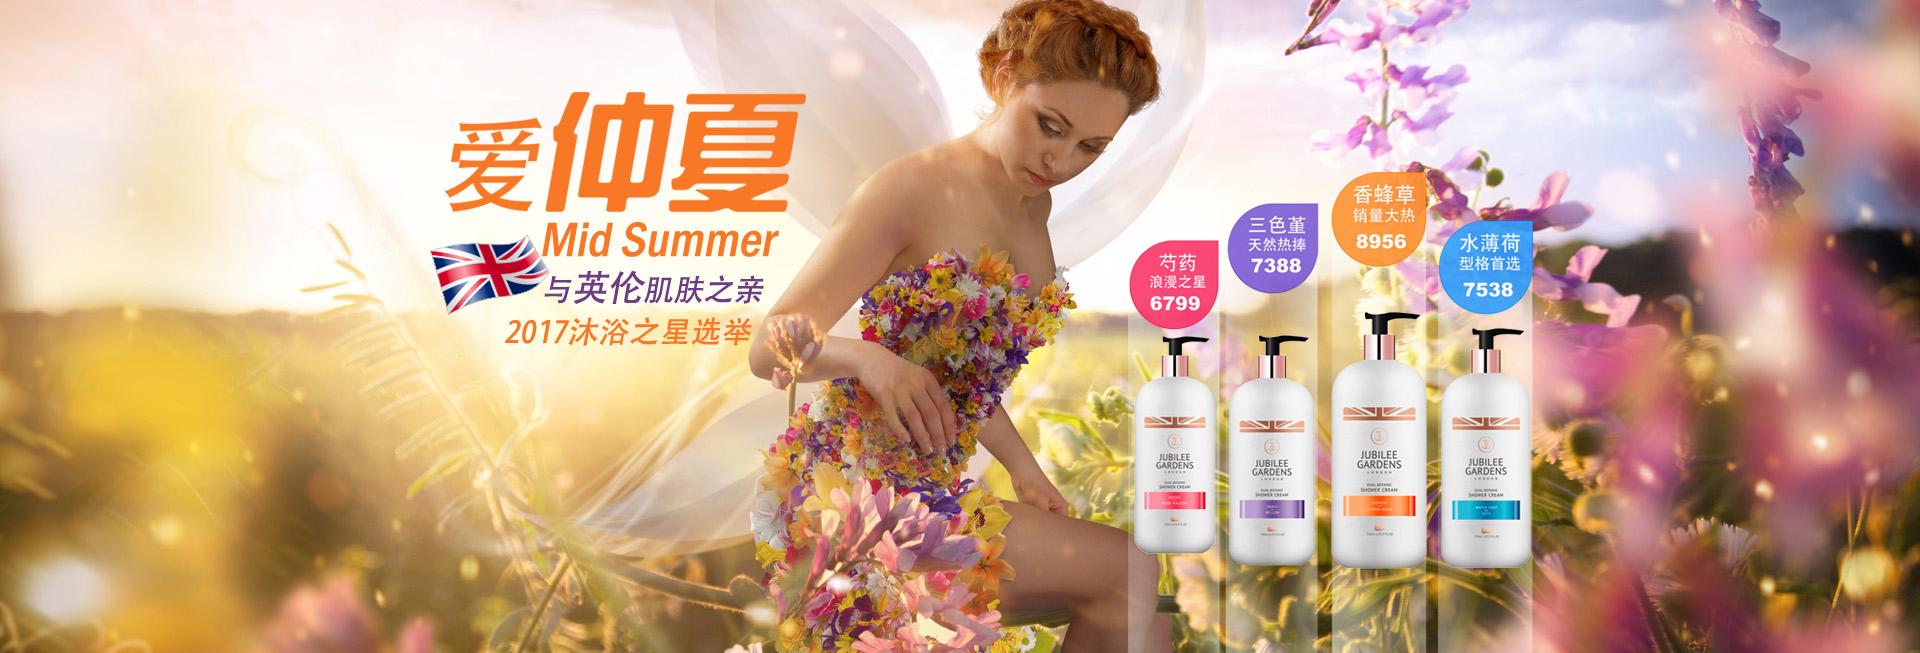 Jubilee Gardens 2017 Summer Promotion